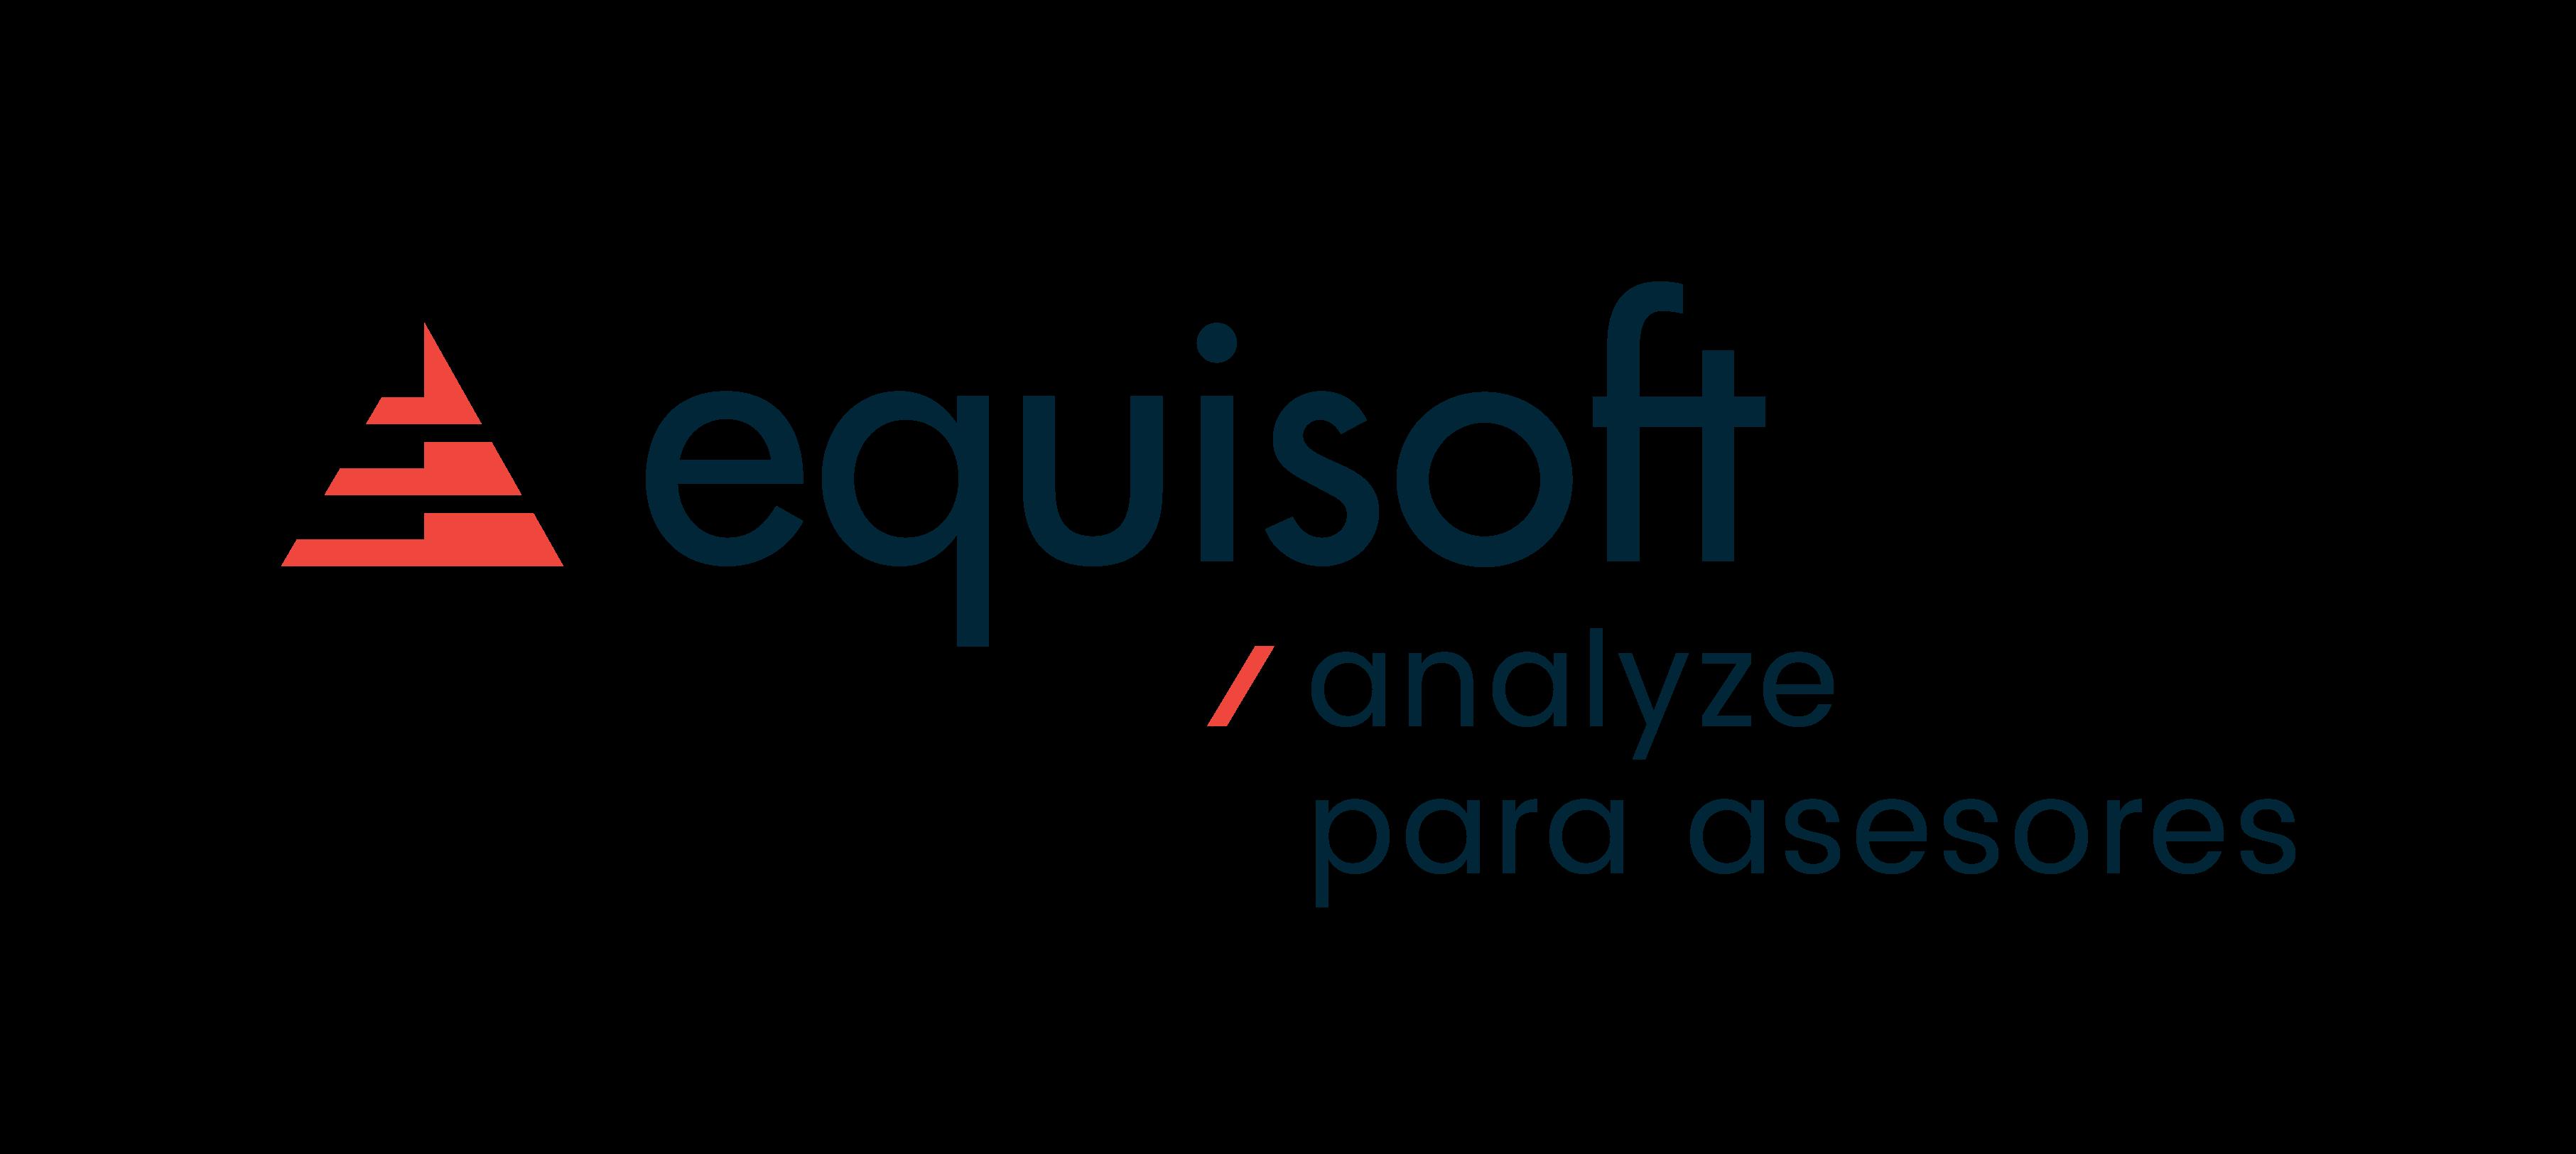 Equisoft/analyze